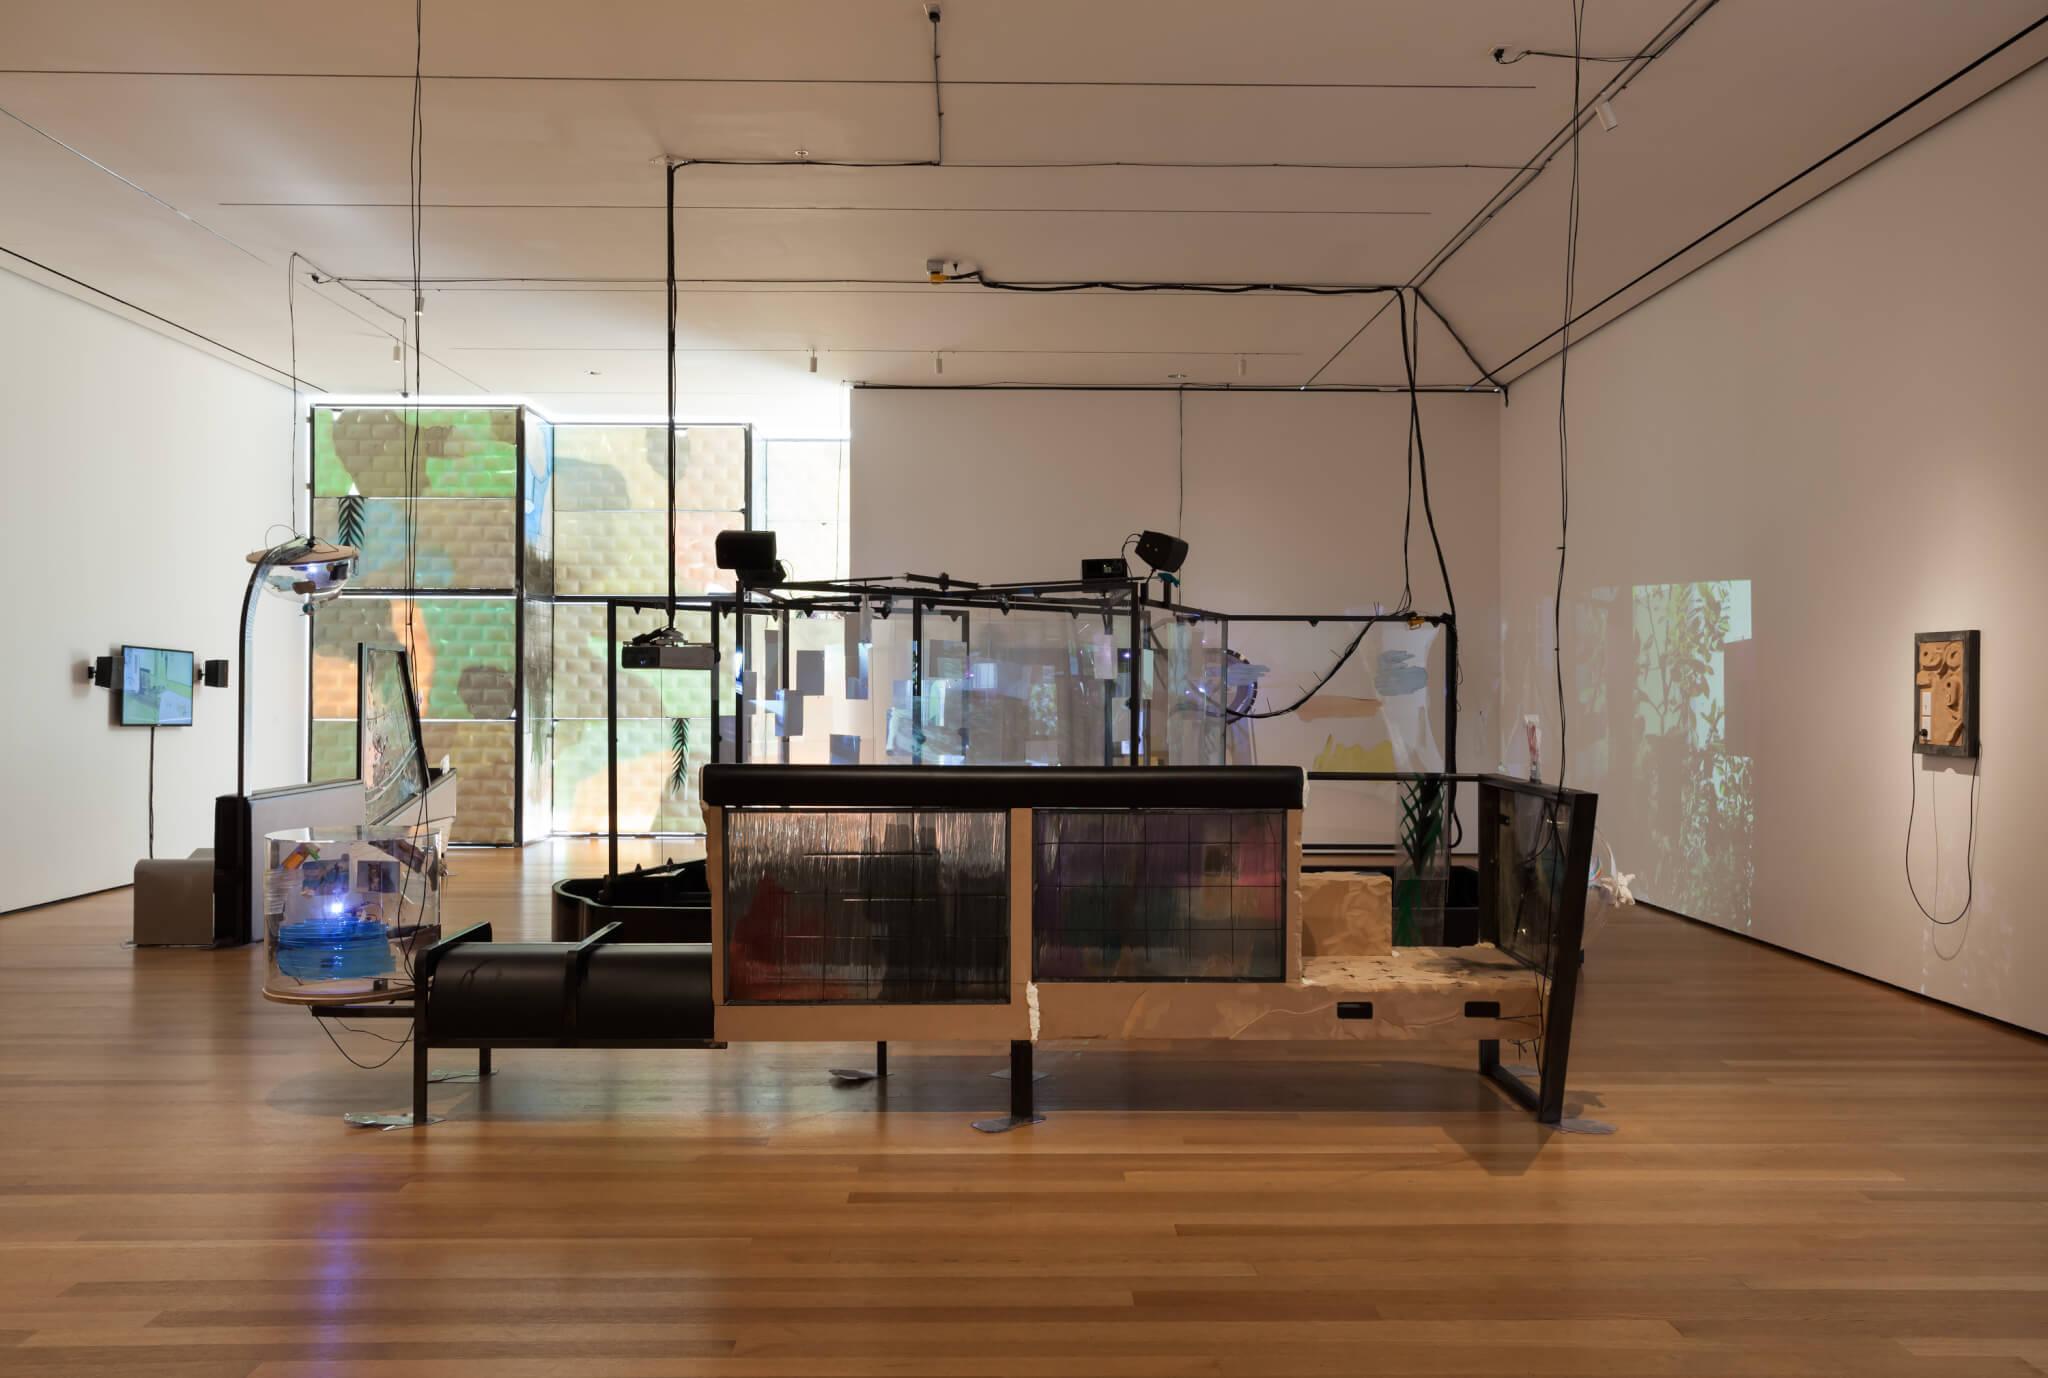 Beloufa_2016_MoMA_Install2